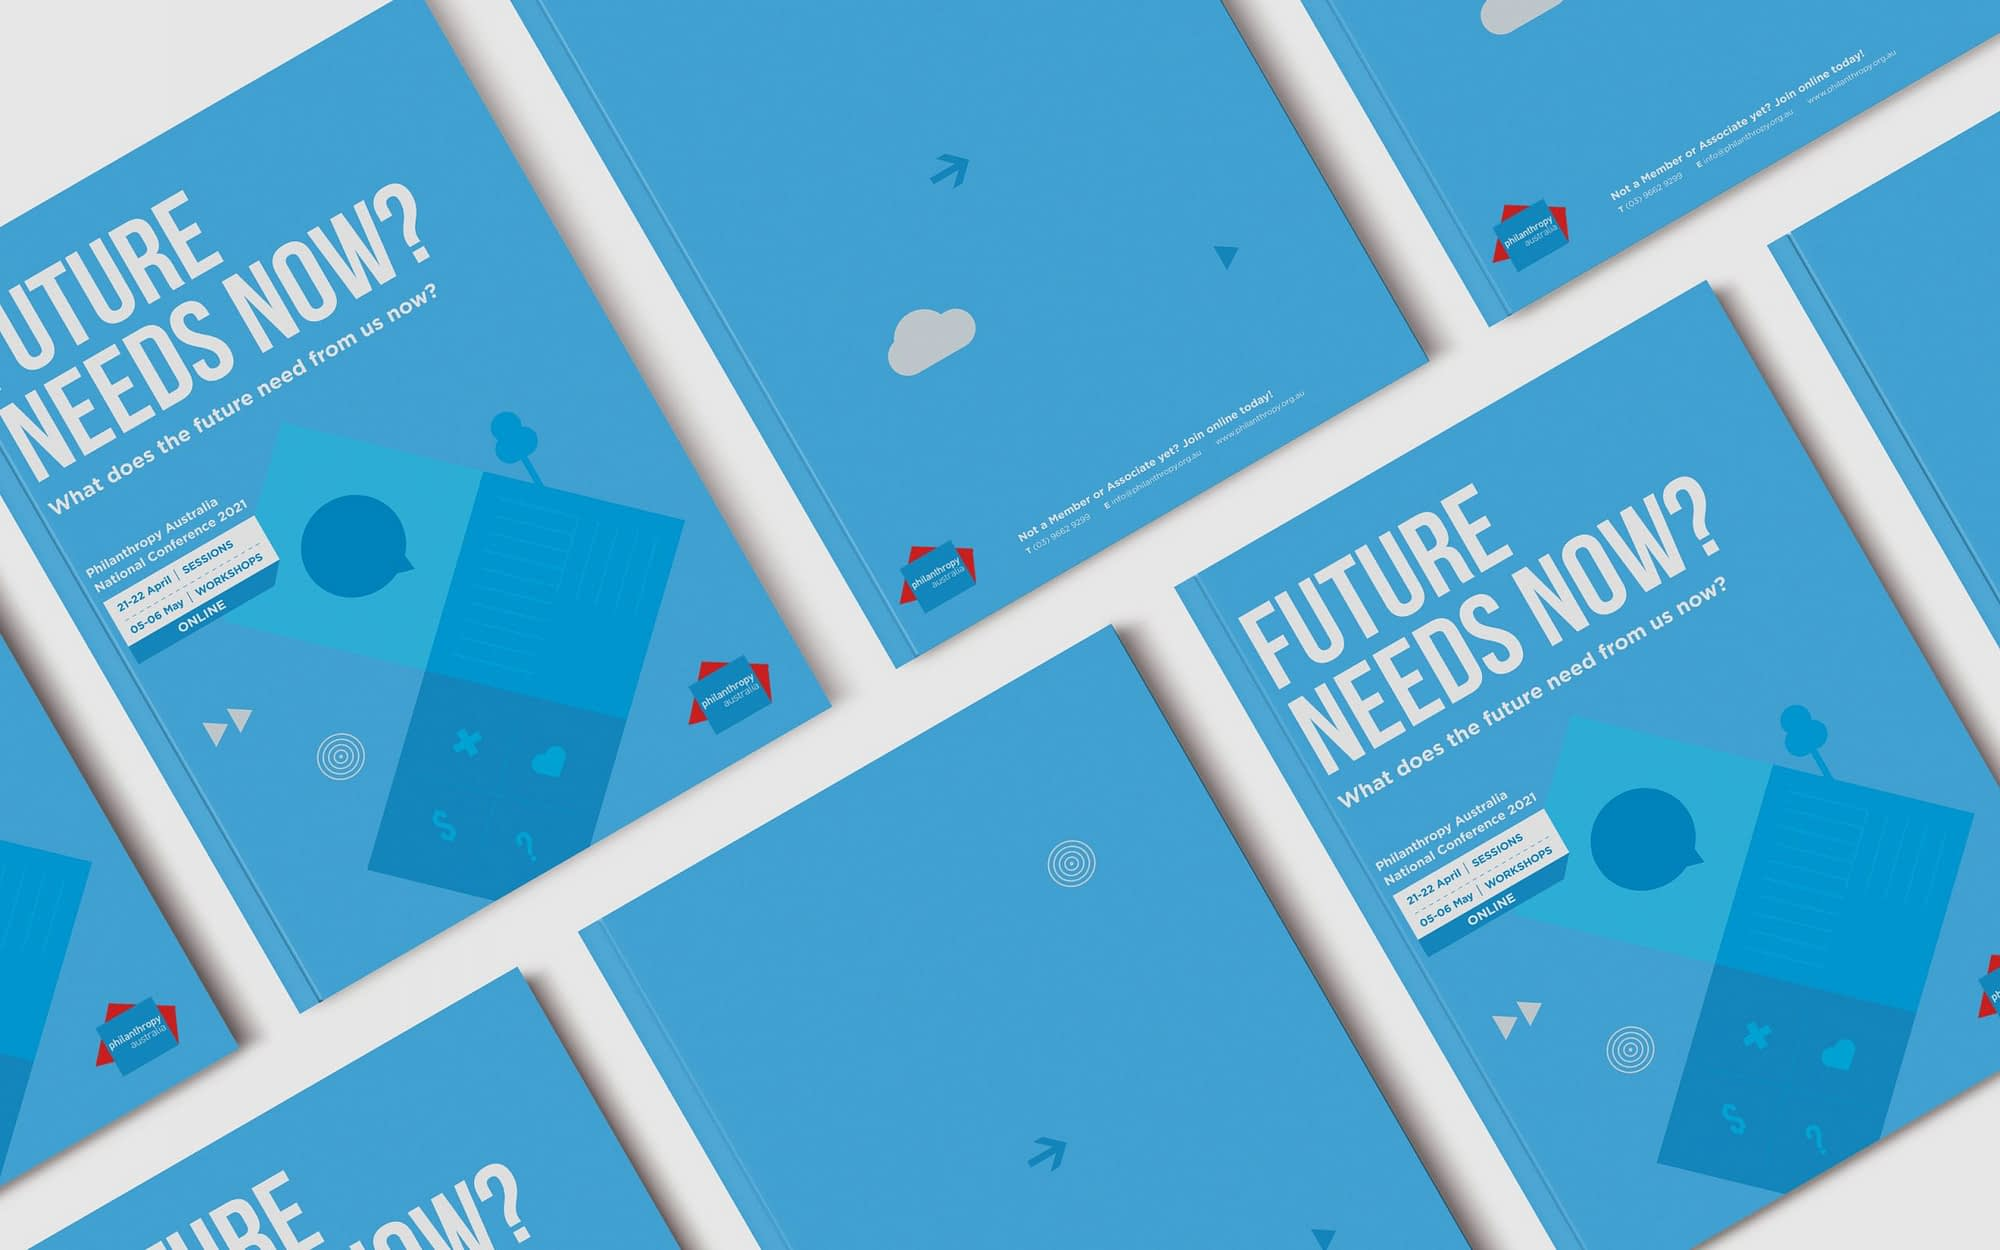 Philanthropy Australia National Conference 2021 Program cover